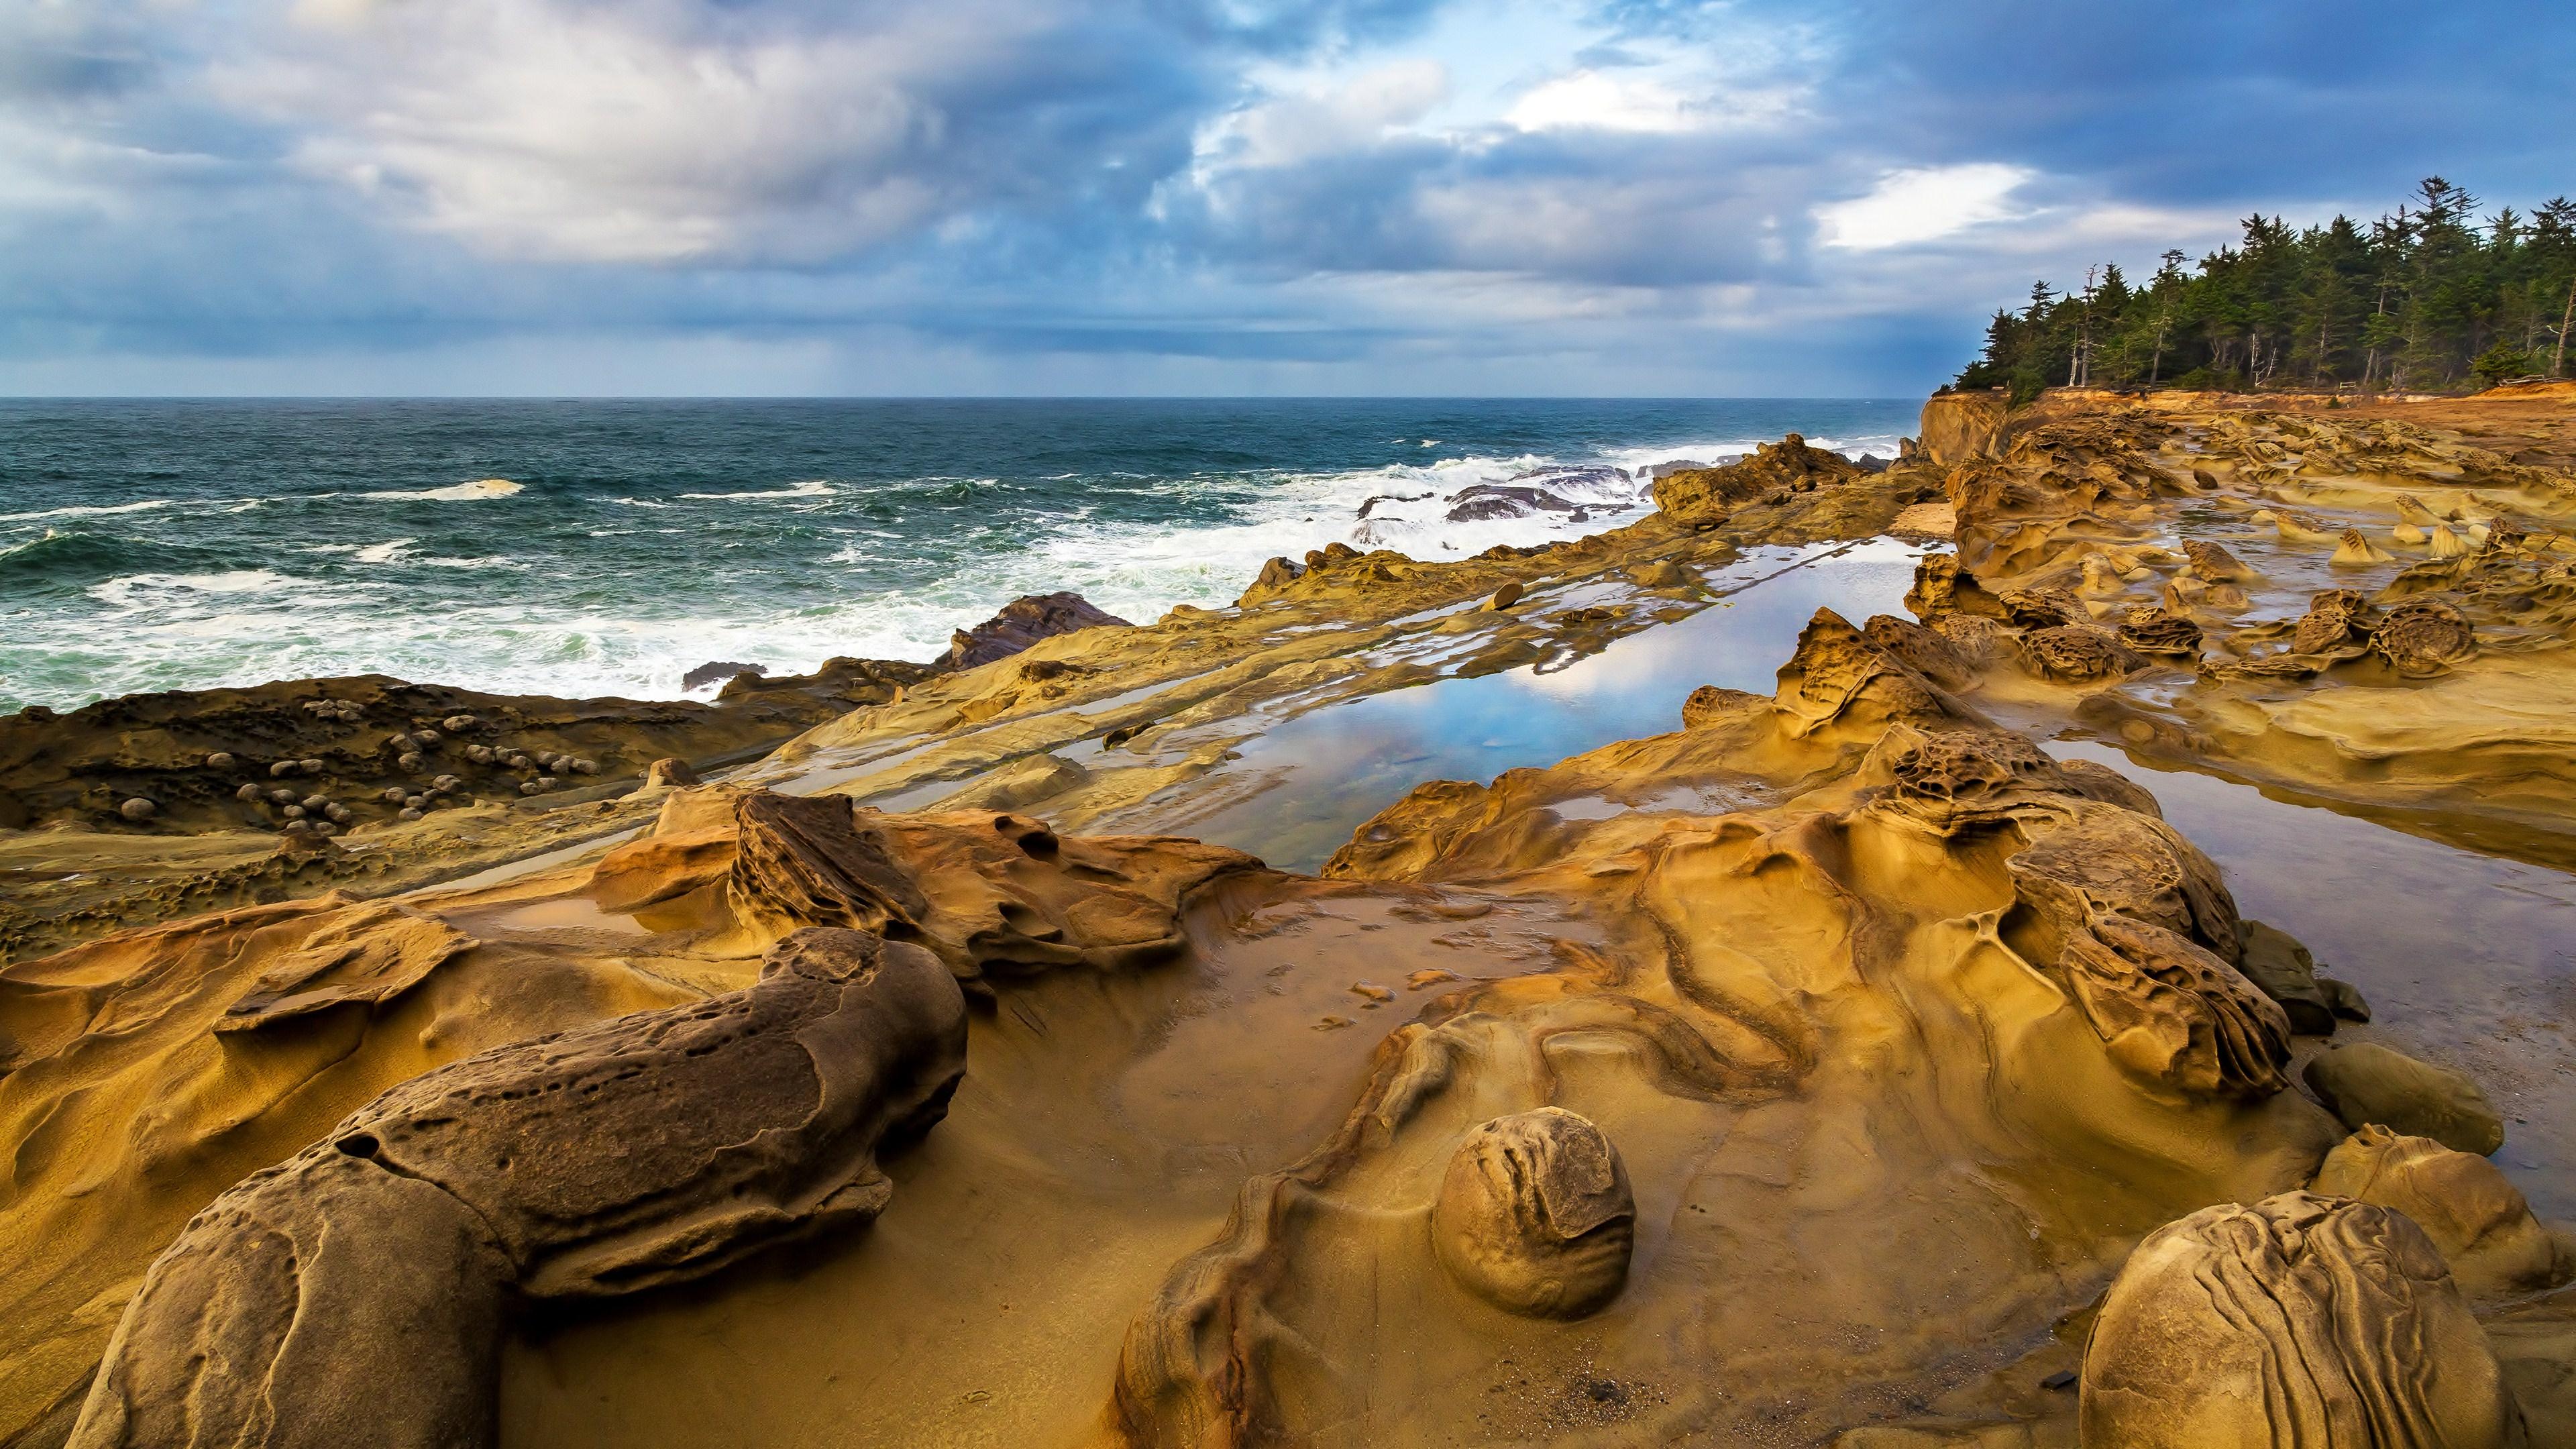 Ocean Scenery 4K Wallpaper Full 1080p Ultra HD Wallpapers 3840x2160